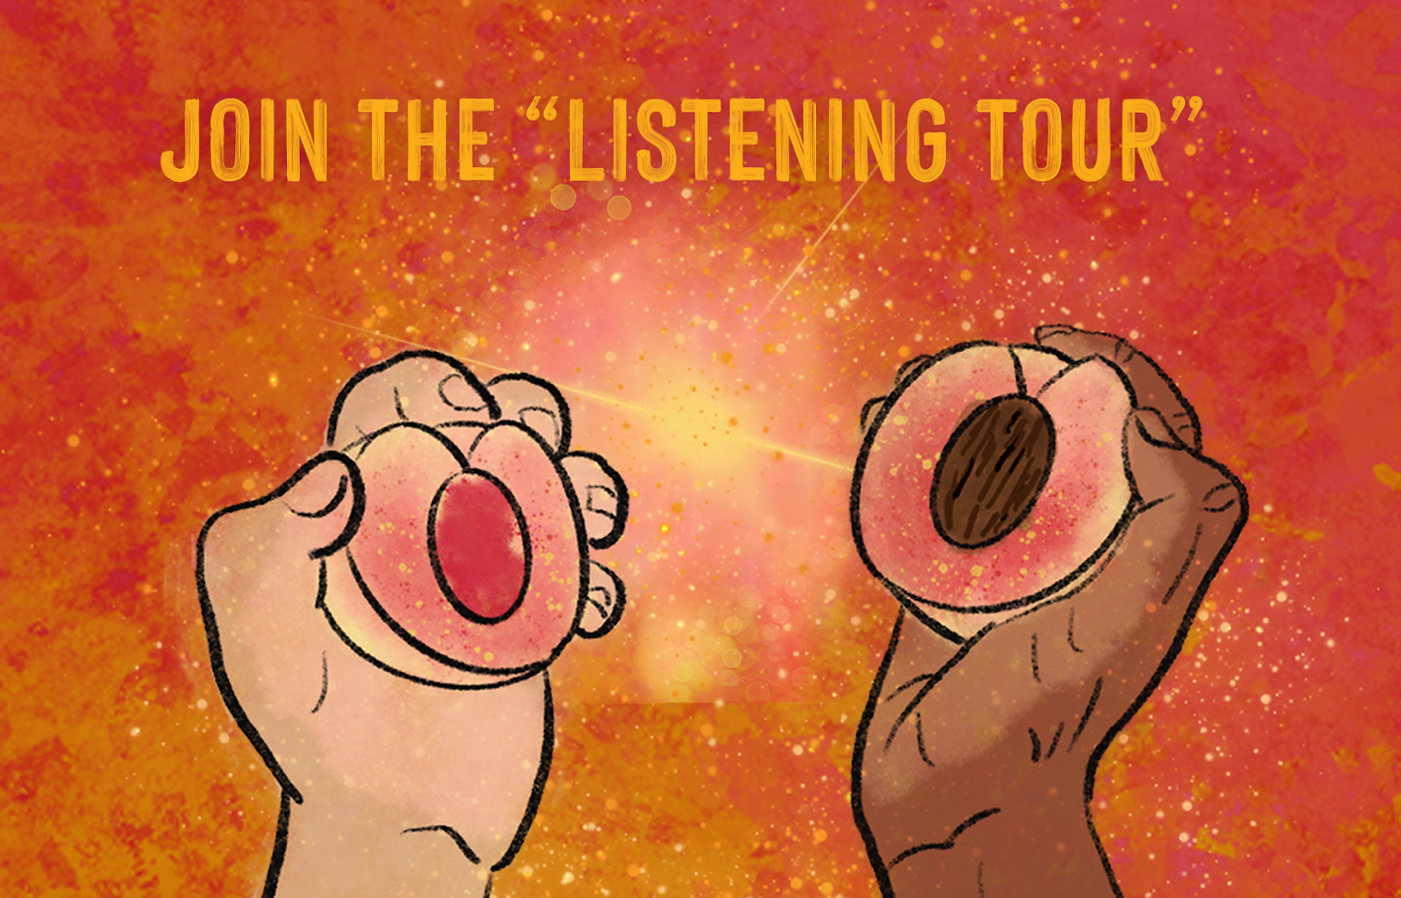 tour-web header.jpg